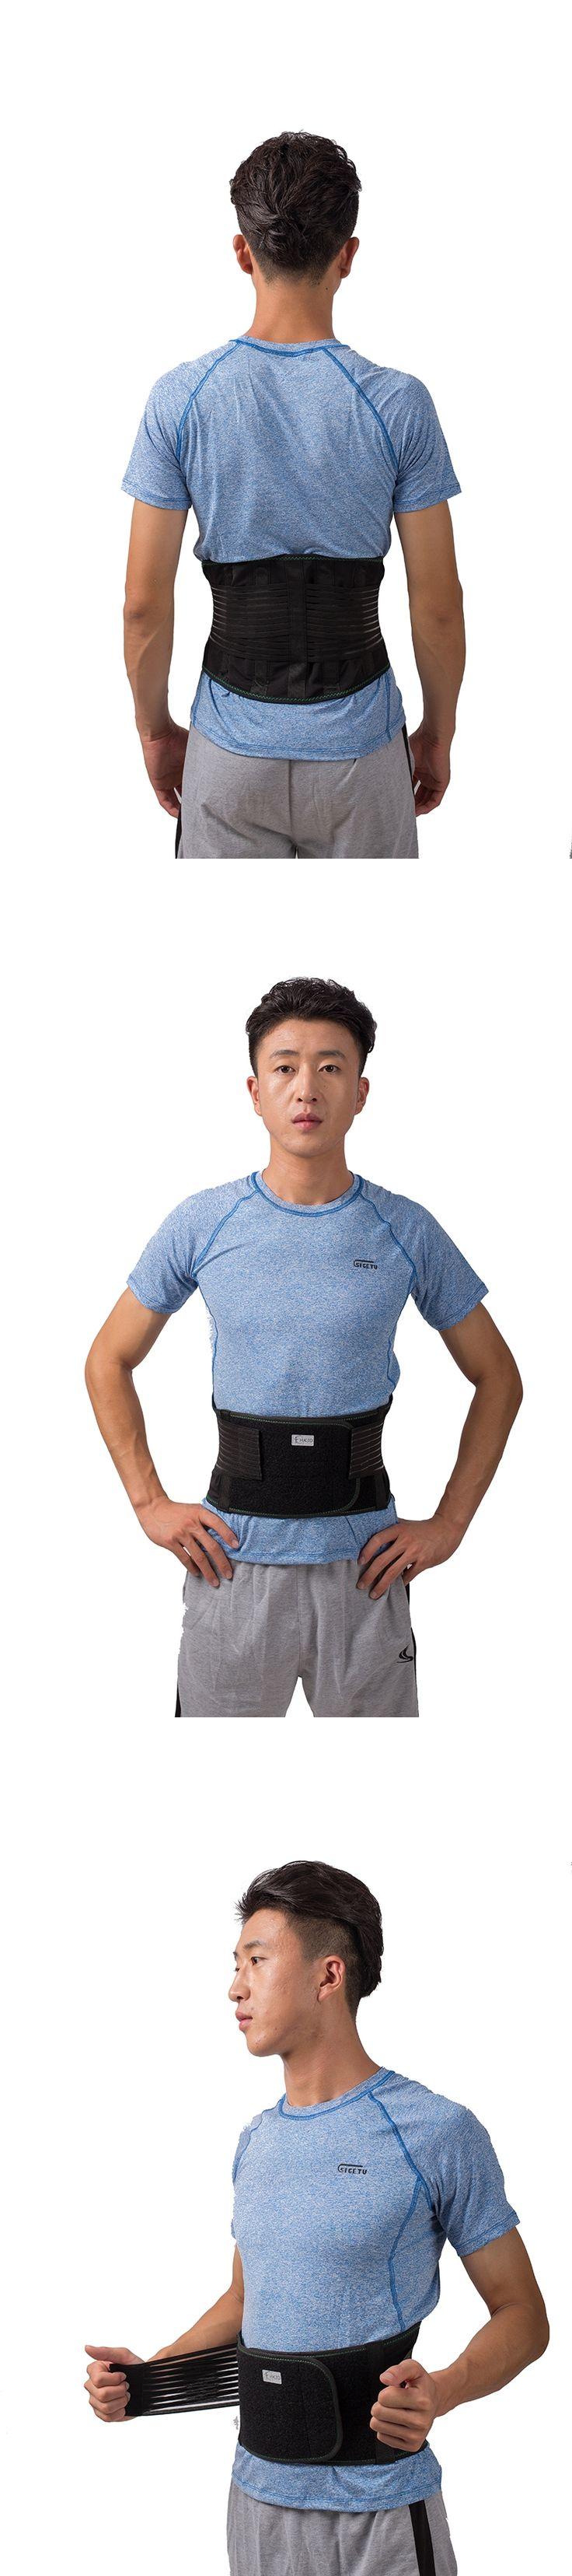 Lower Back Brace Lumbar Support Waist Belt Corset for Lumbar disc herniation or prolapse lumbar muscle strain lower thoracic